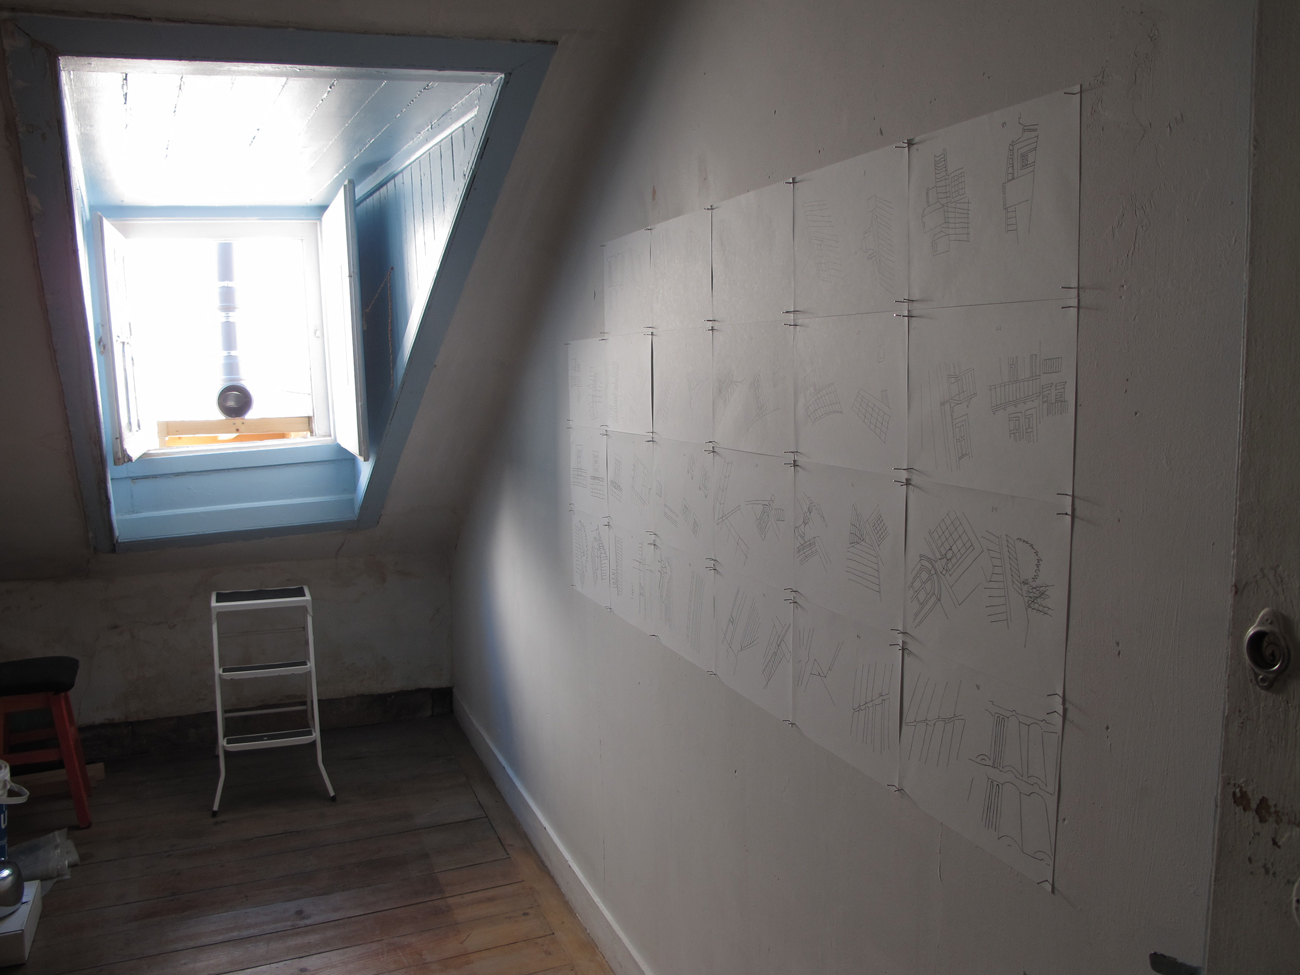 drawings on room wall